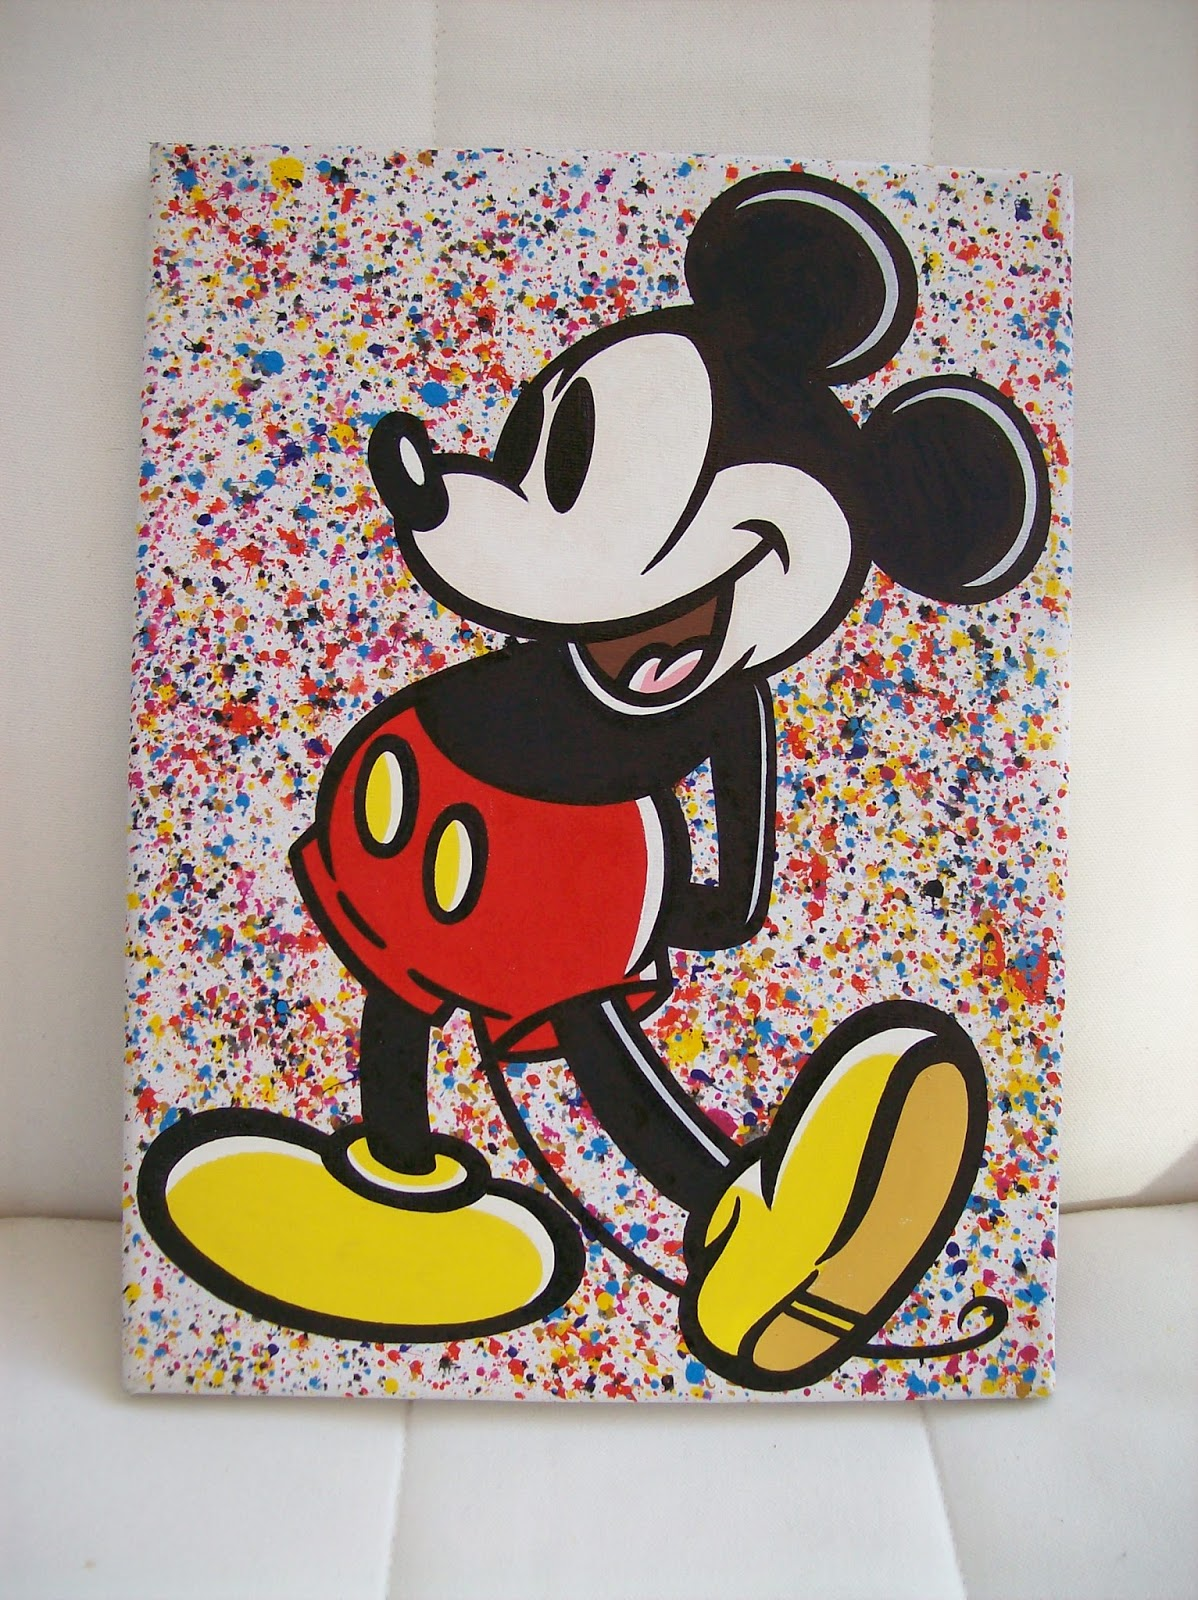 Jdtoonart Cartoon and Comic pop art Paintings: Mickey Mouse